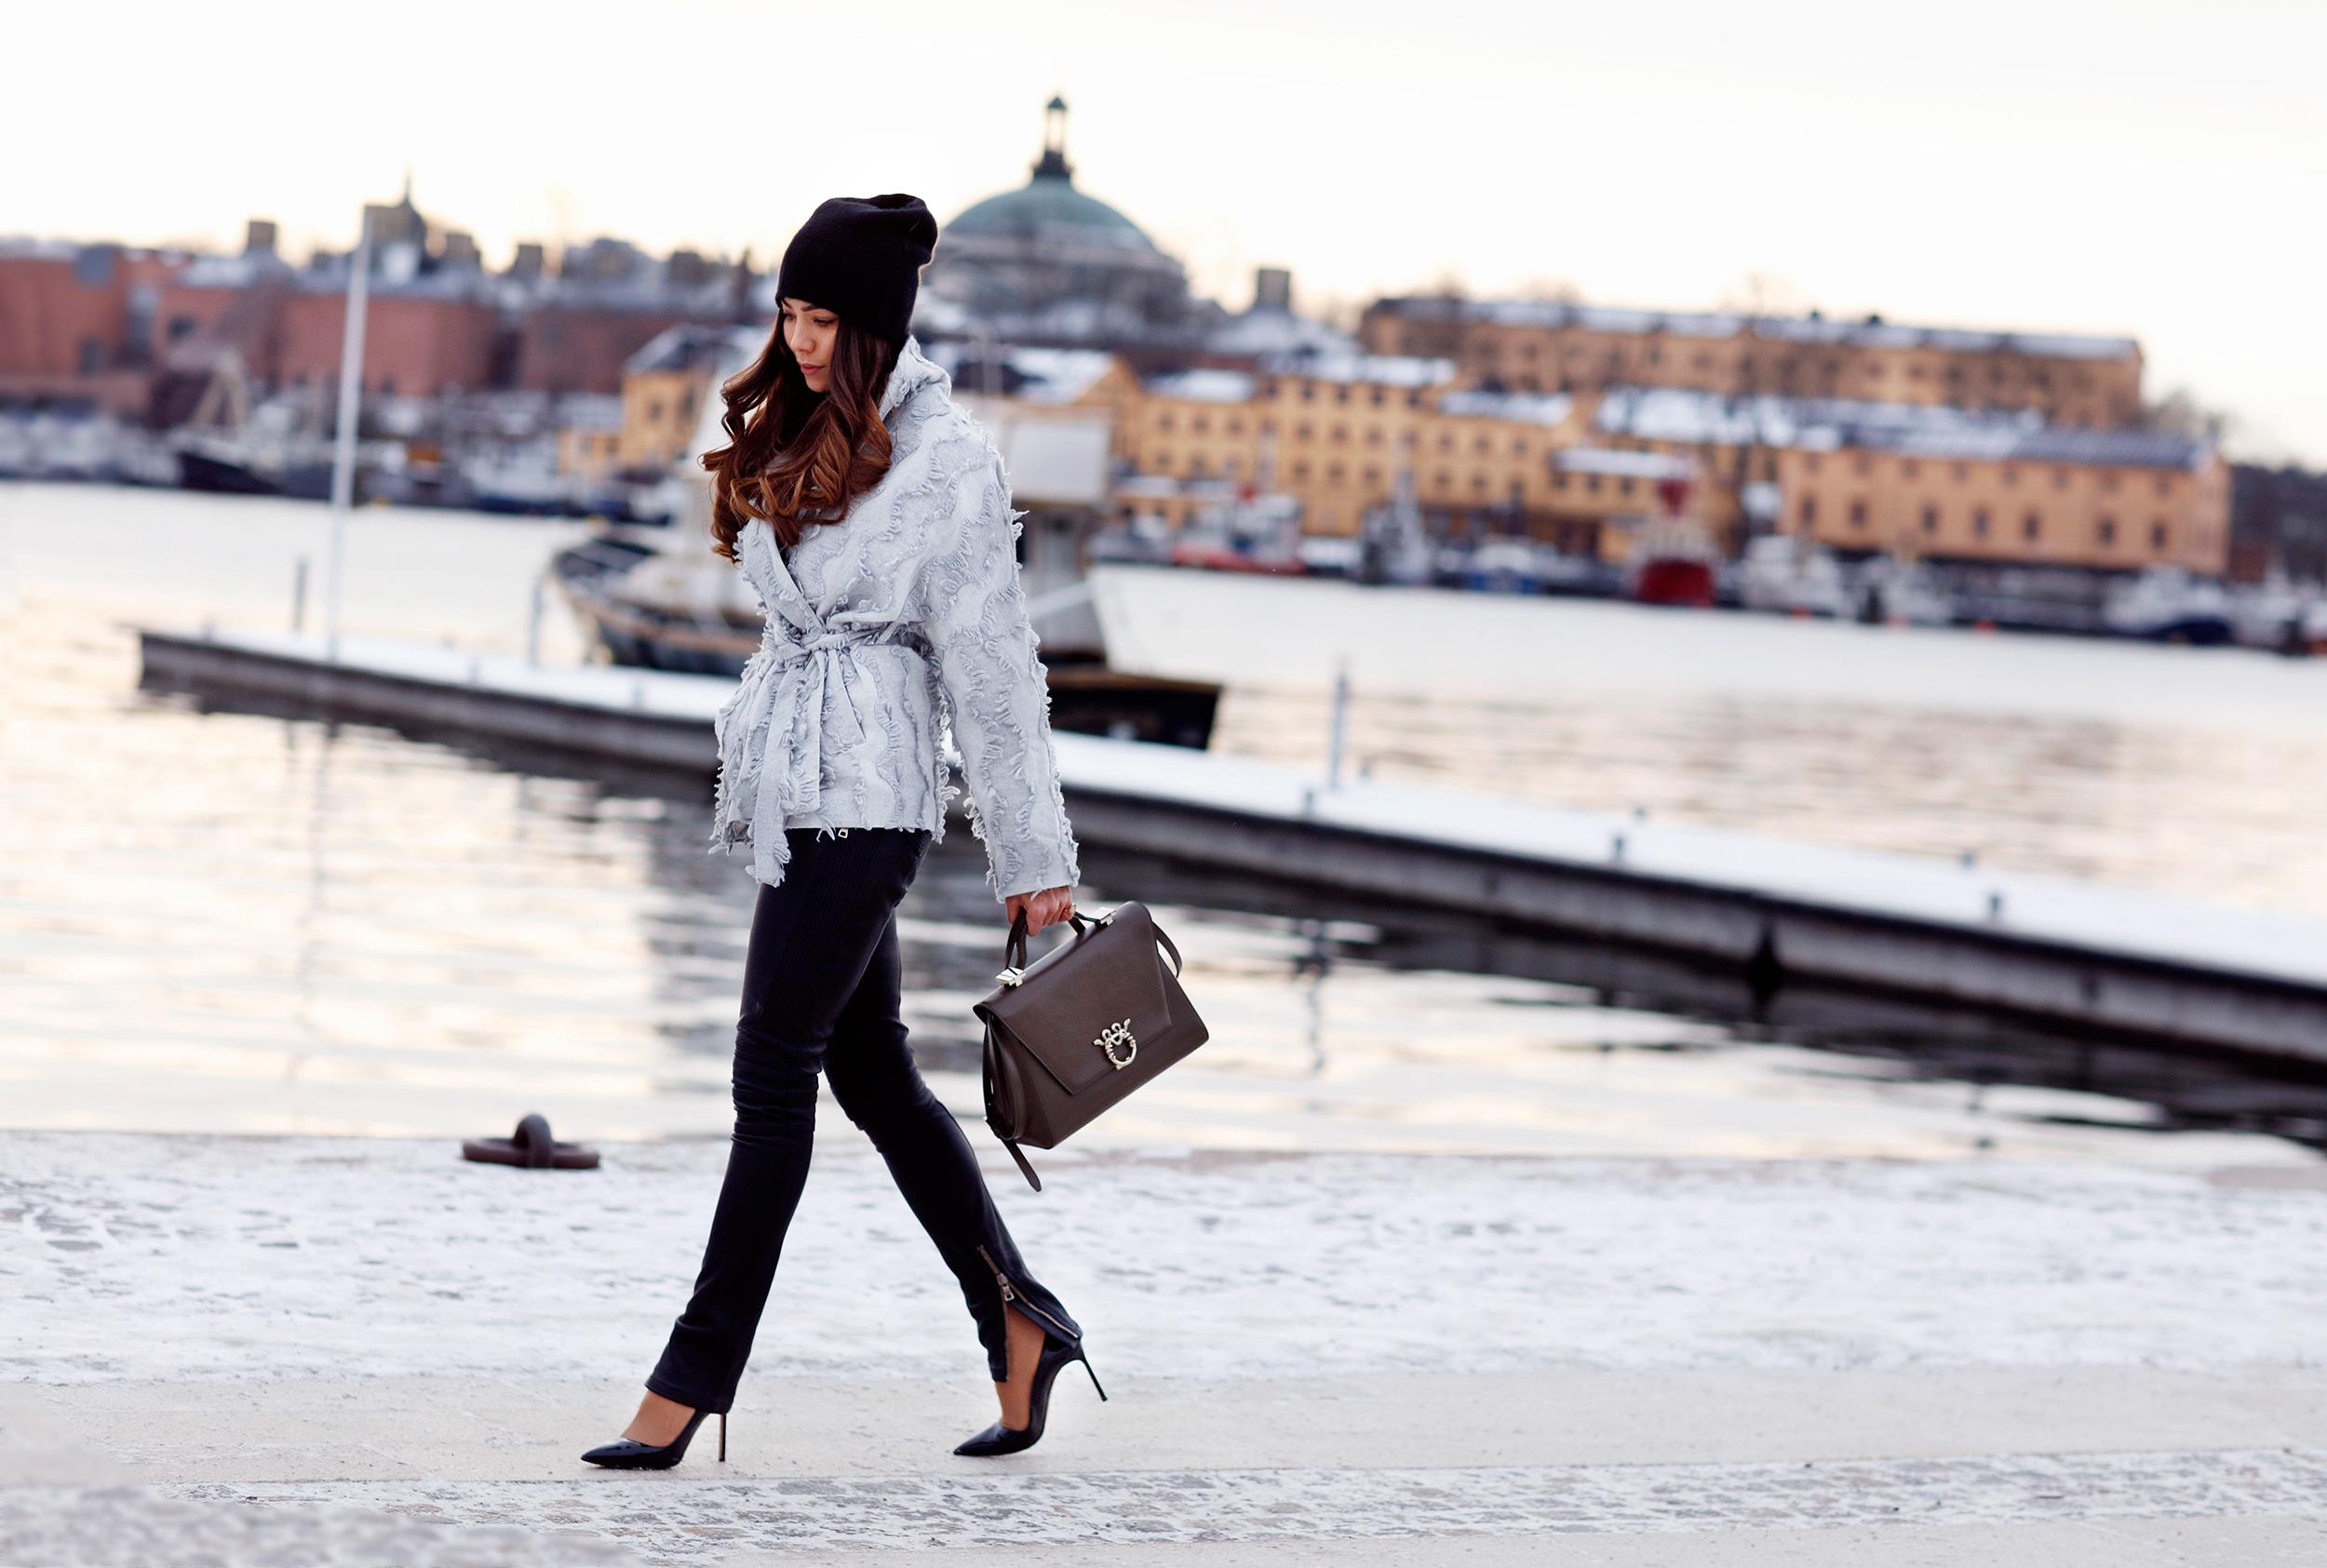 AMA_Stockholm1c.jpg